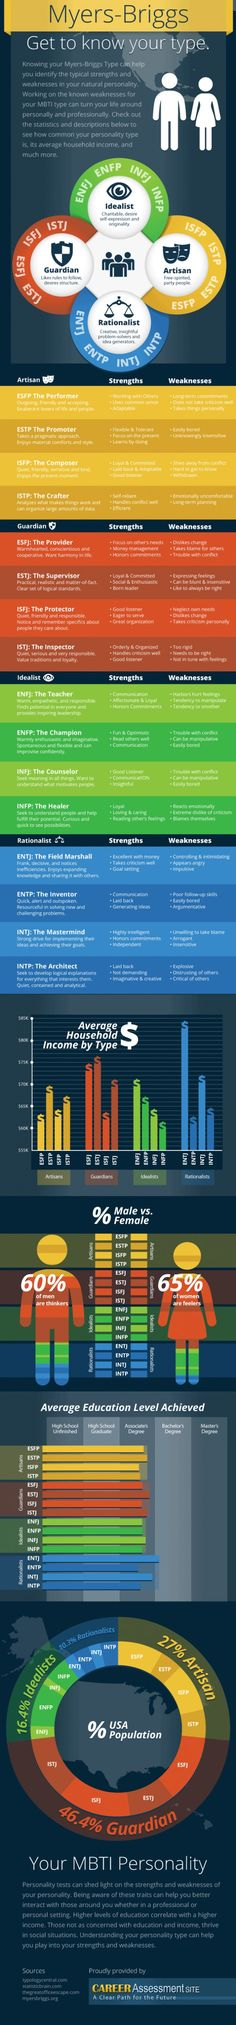 Myers-Briggs Personality Socio-Economic Status Infographic. I'm ESTJ. A speaker…